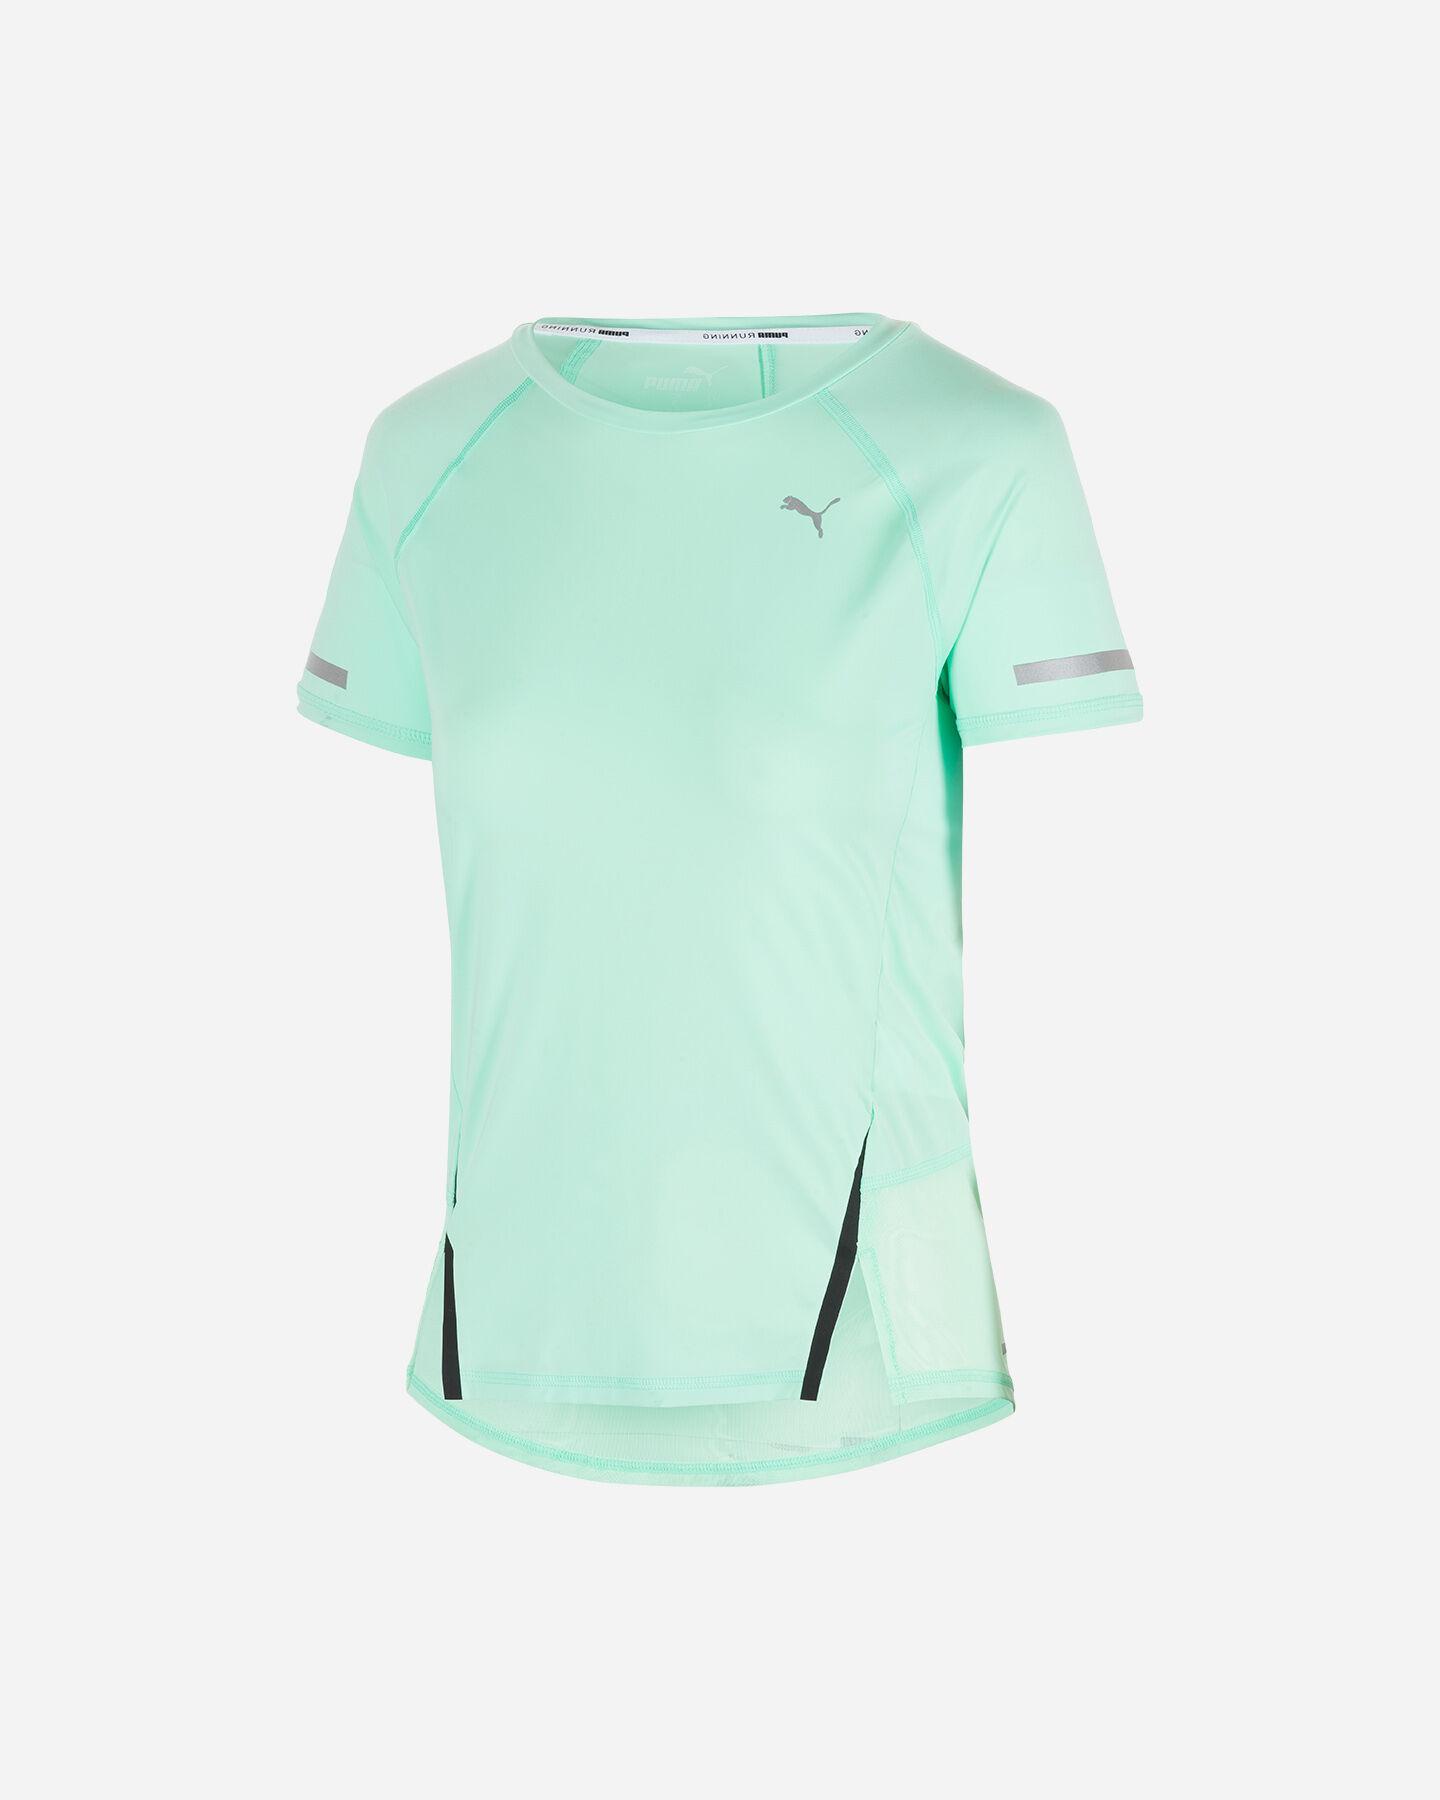 T-Shirt running PUMA RUN BIO MOTION W S5172919 scatto 0